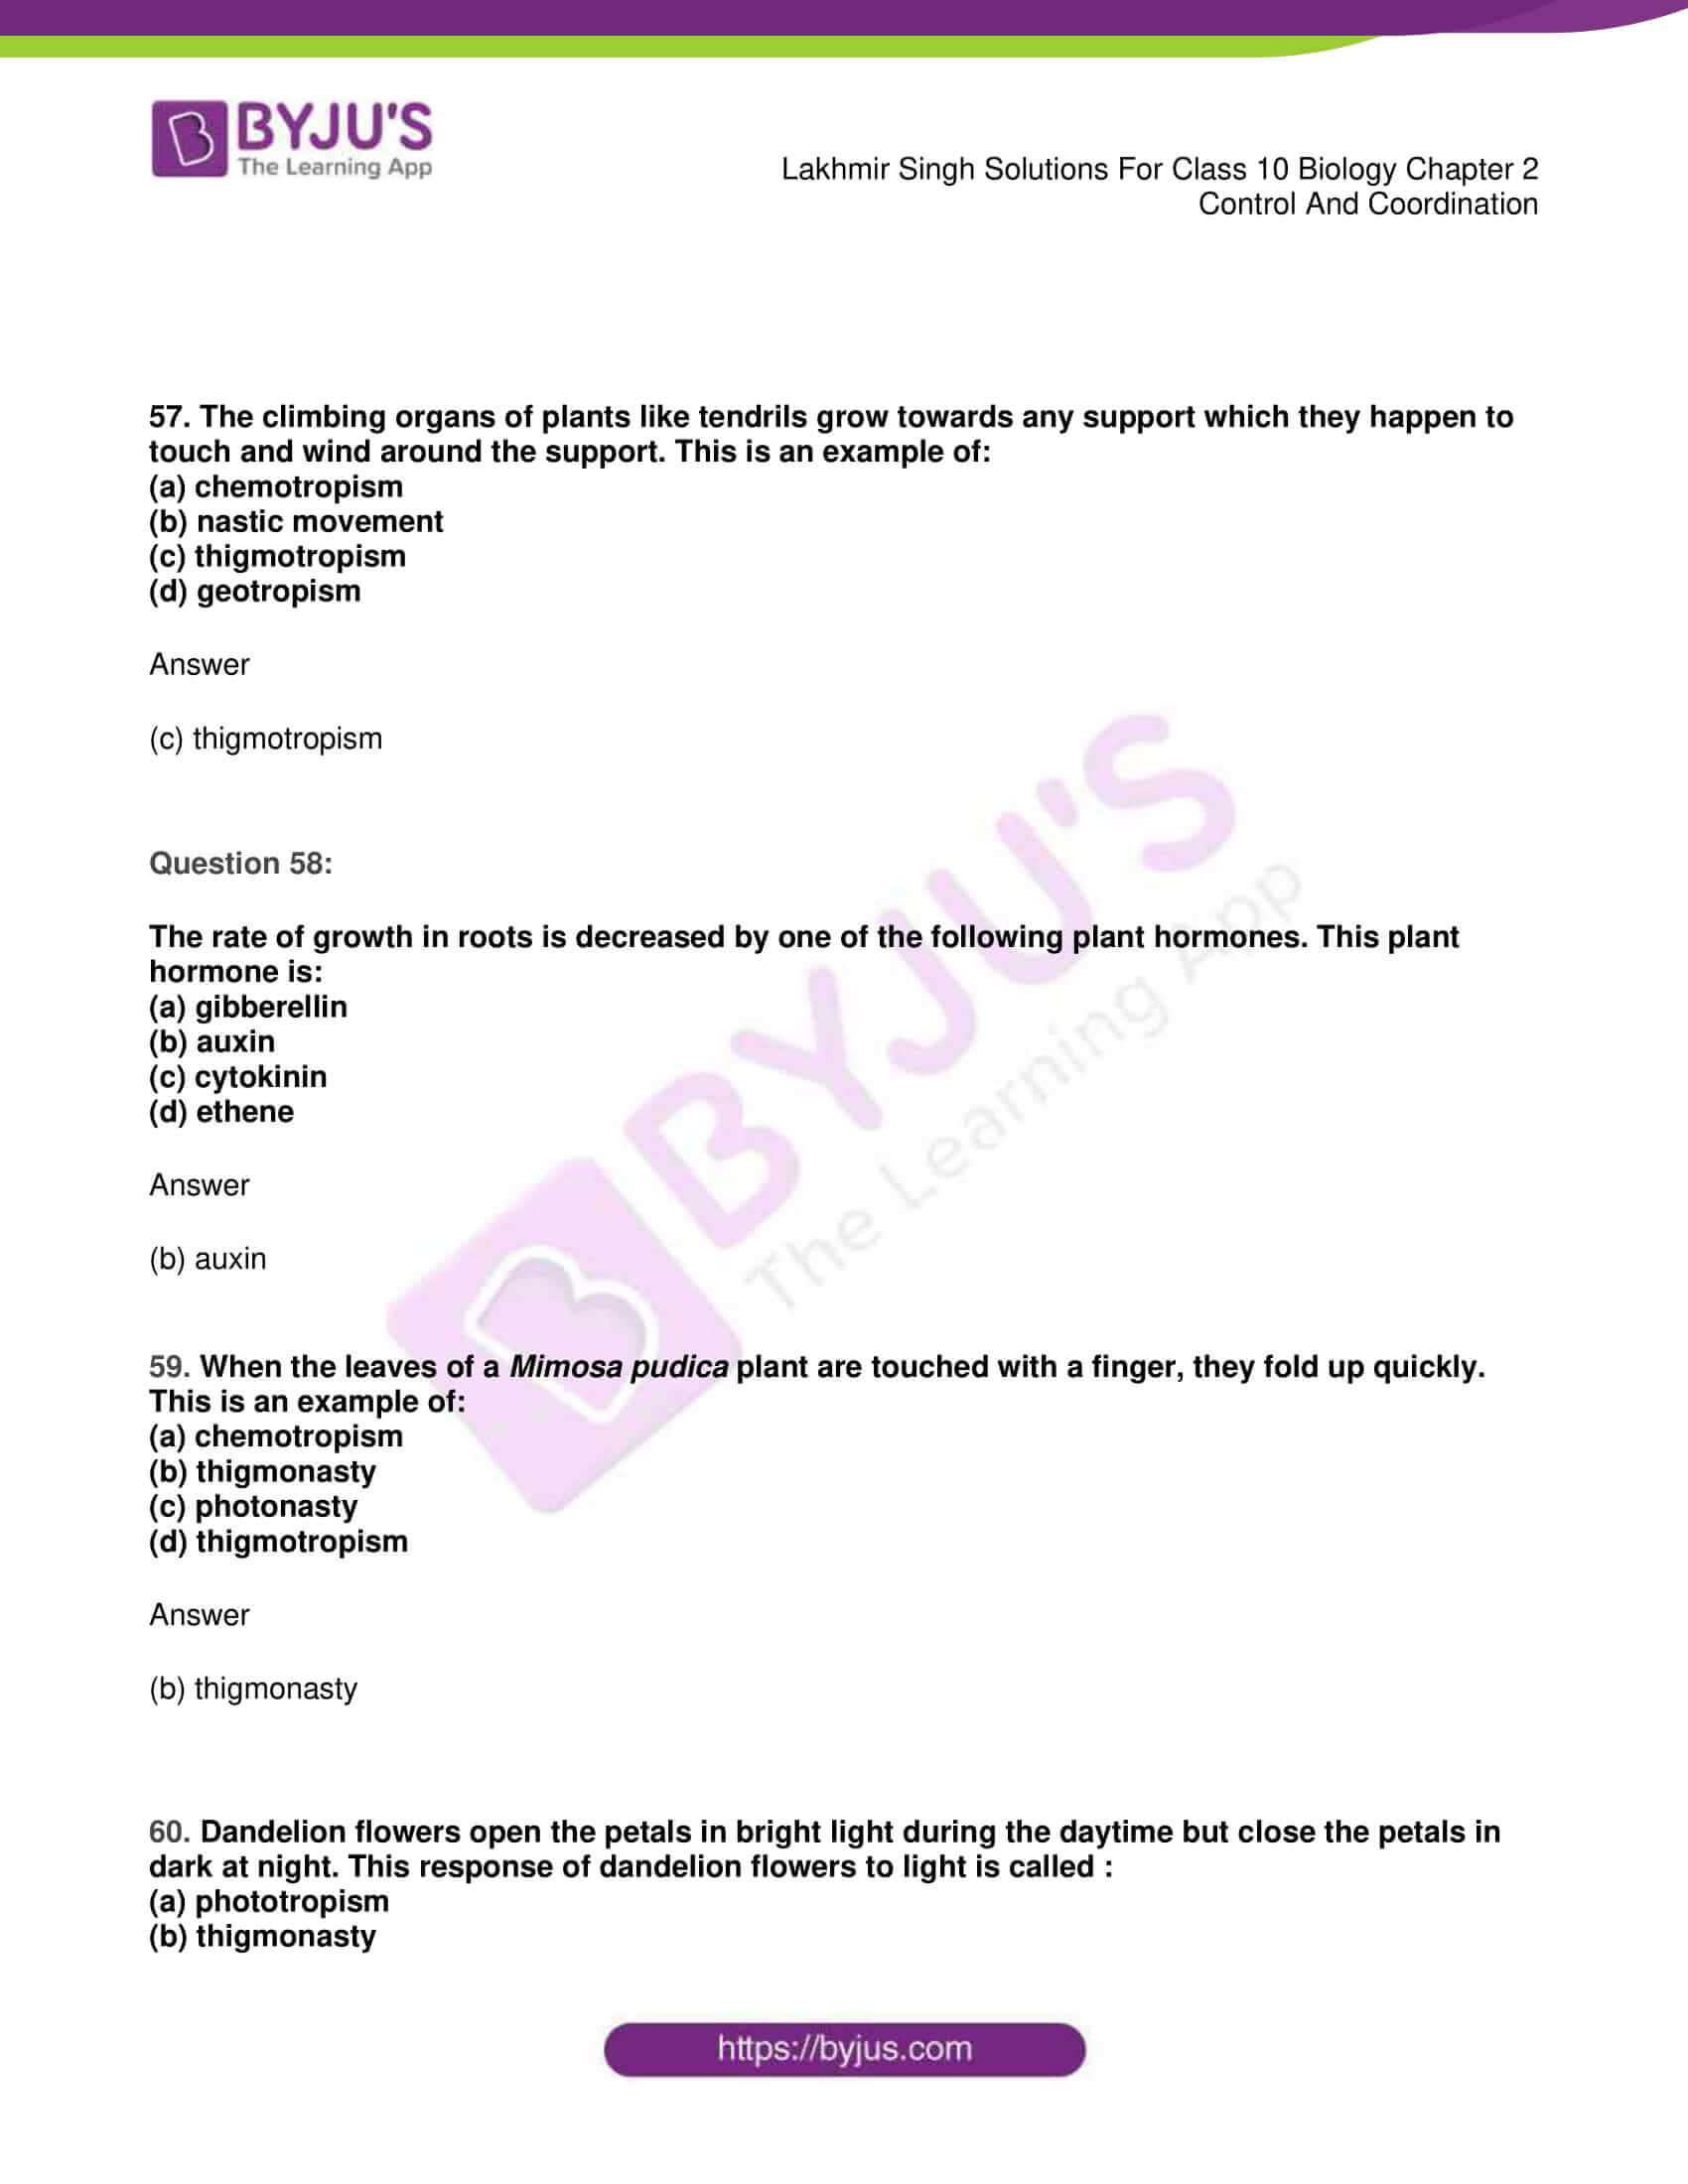 lakhmir singh sol class 10 biology chapter 2 19